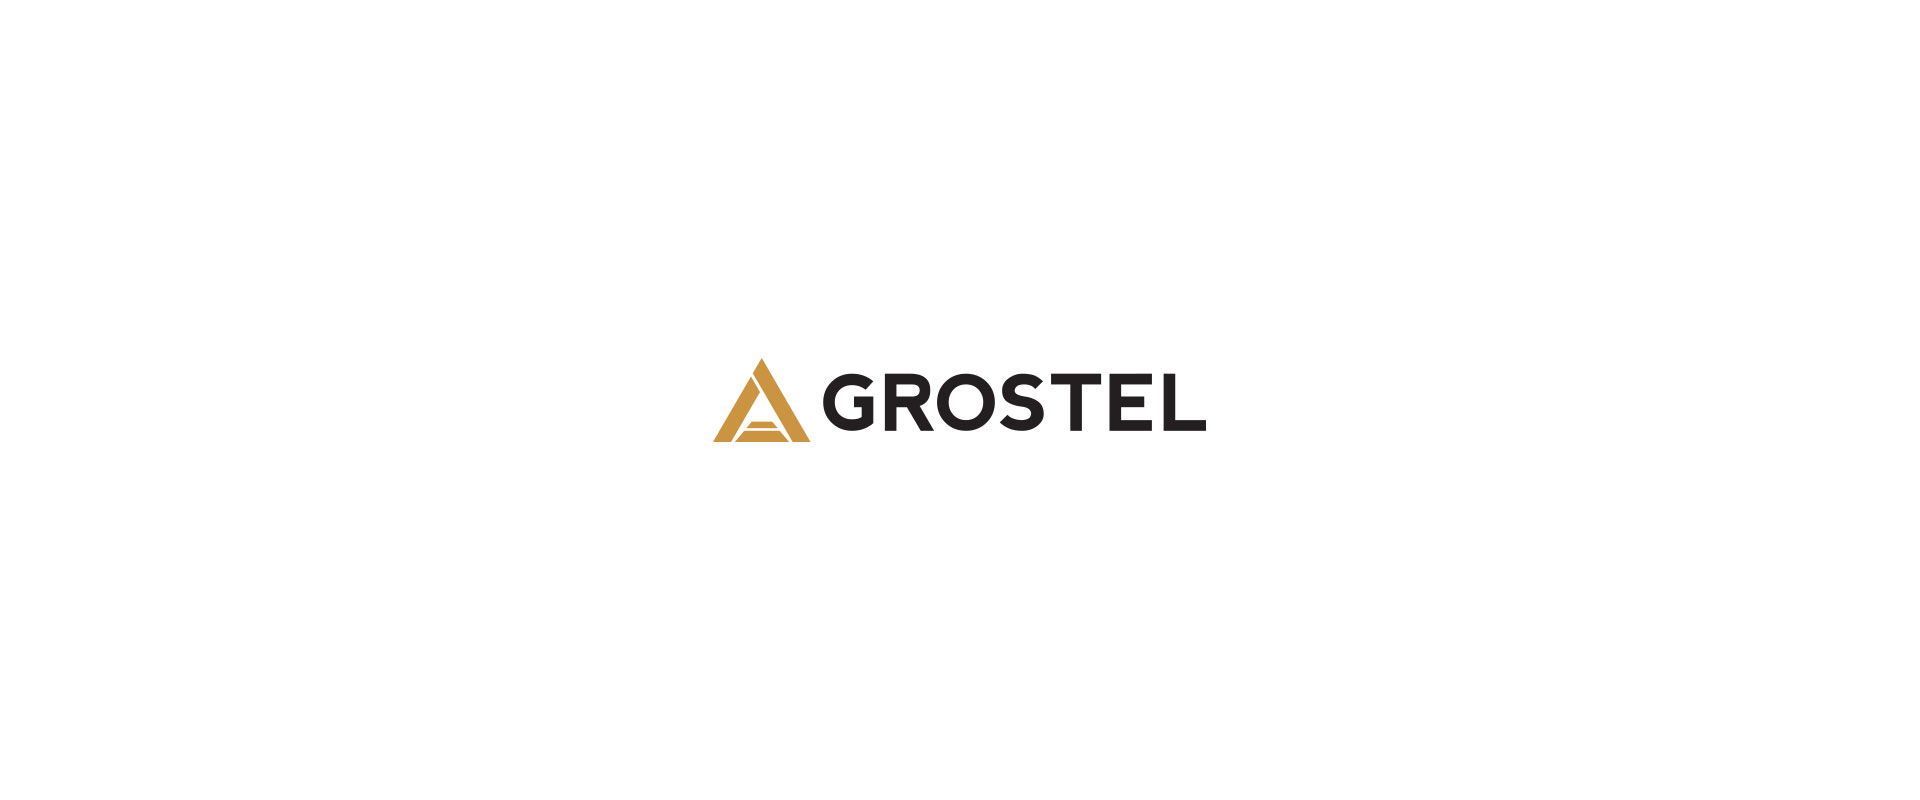 grostel-brand-1